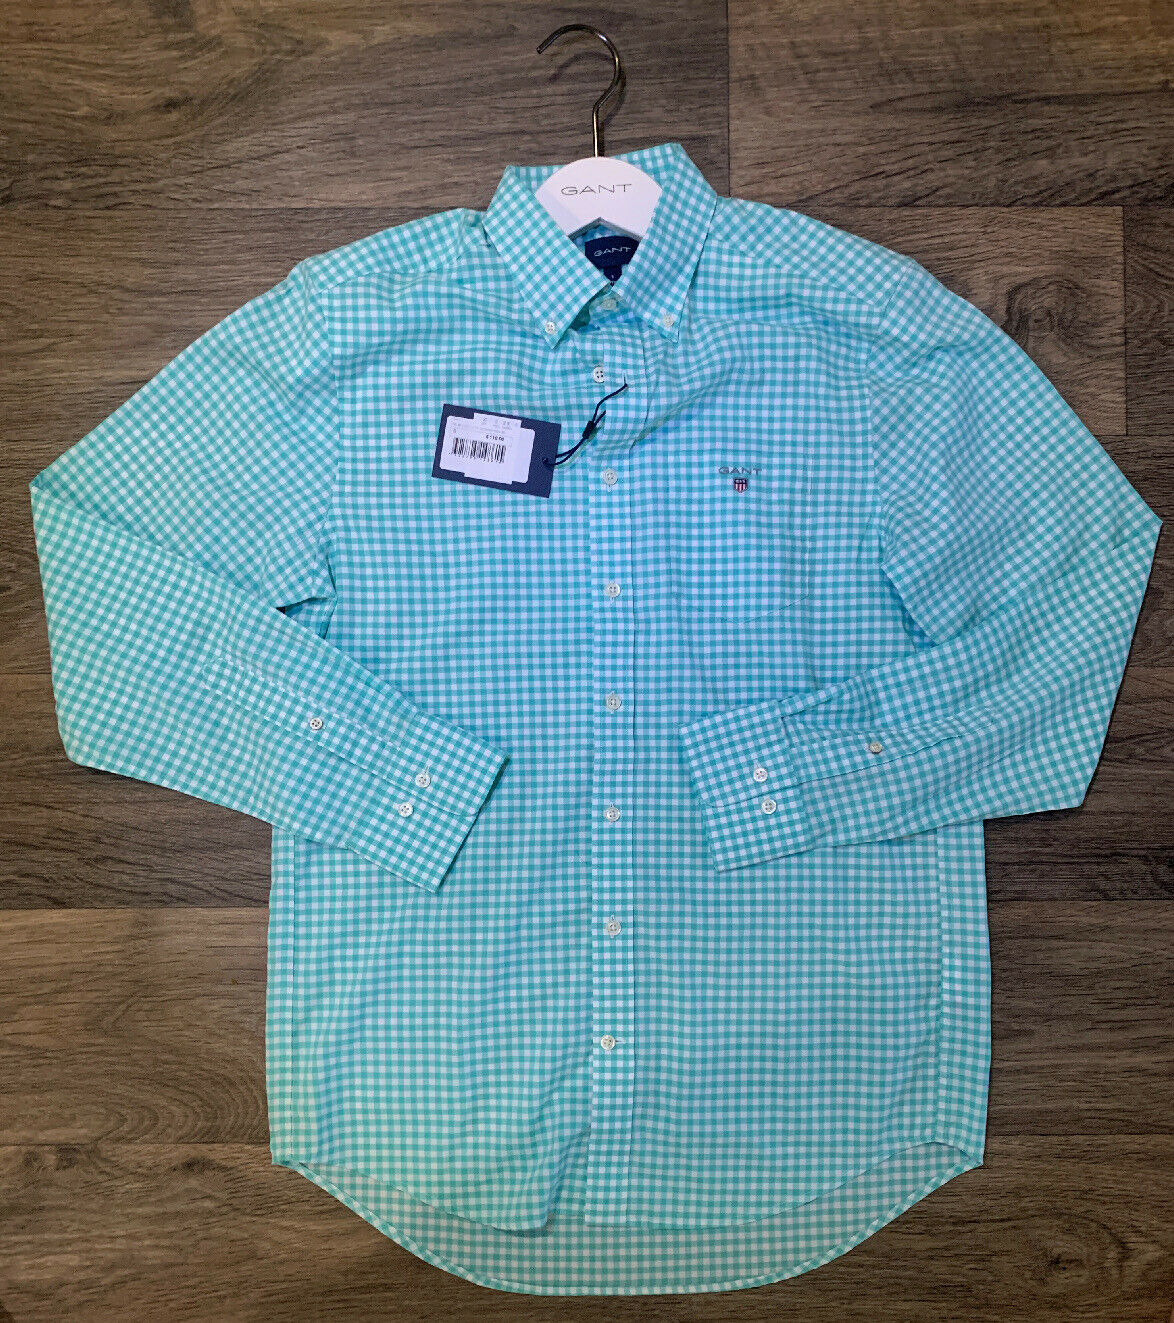 New herren Gant Long Sleeve Button Down Gingham Dress hemd, Größe S, Pool Grün